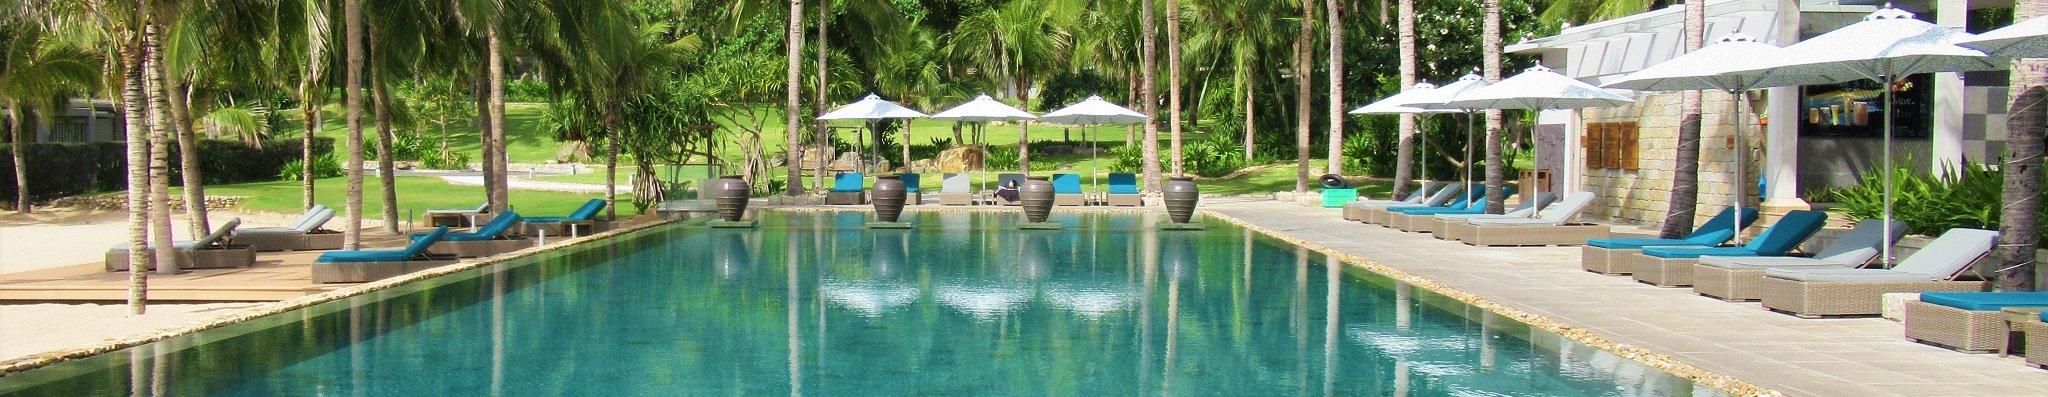 Mia Resort Nha Trang, Vietnam, Independent Review